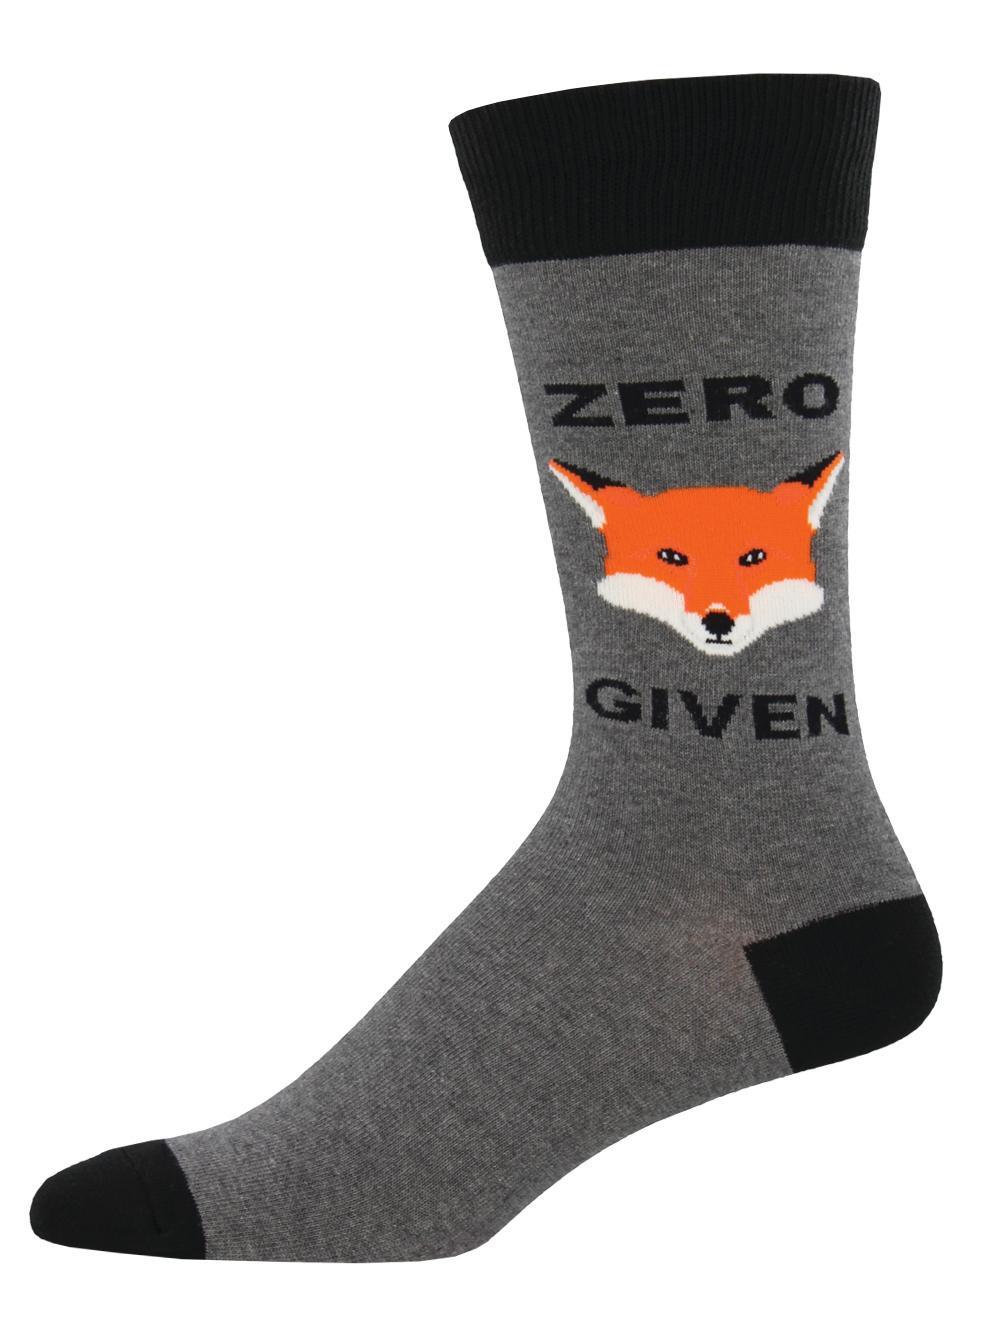 Mens Socks - Zero Fox Given(Size10-13)